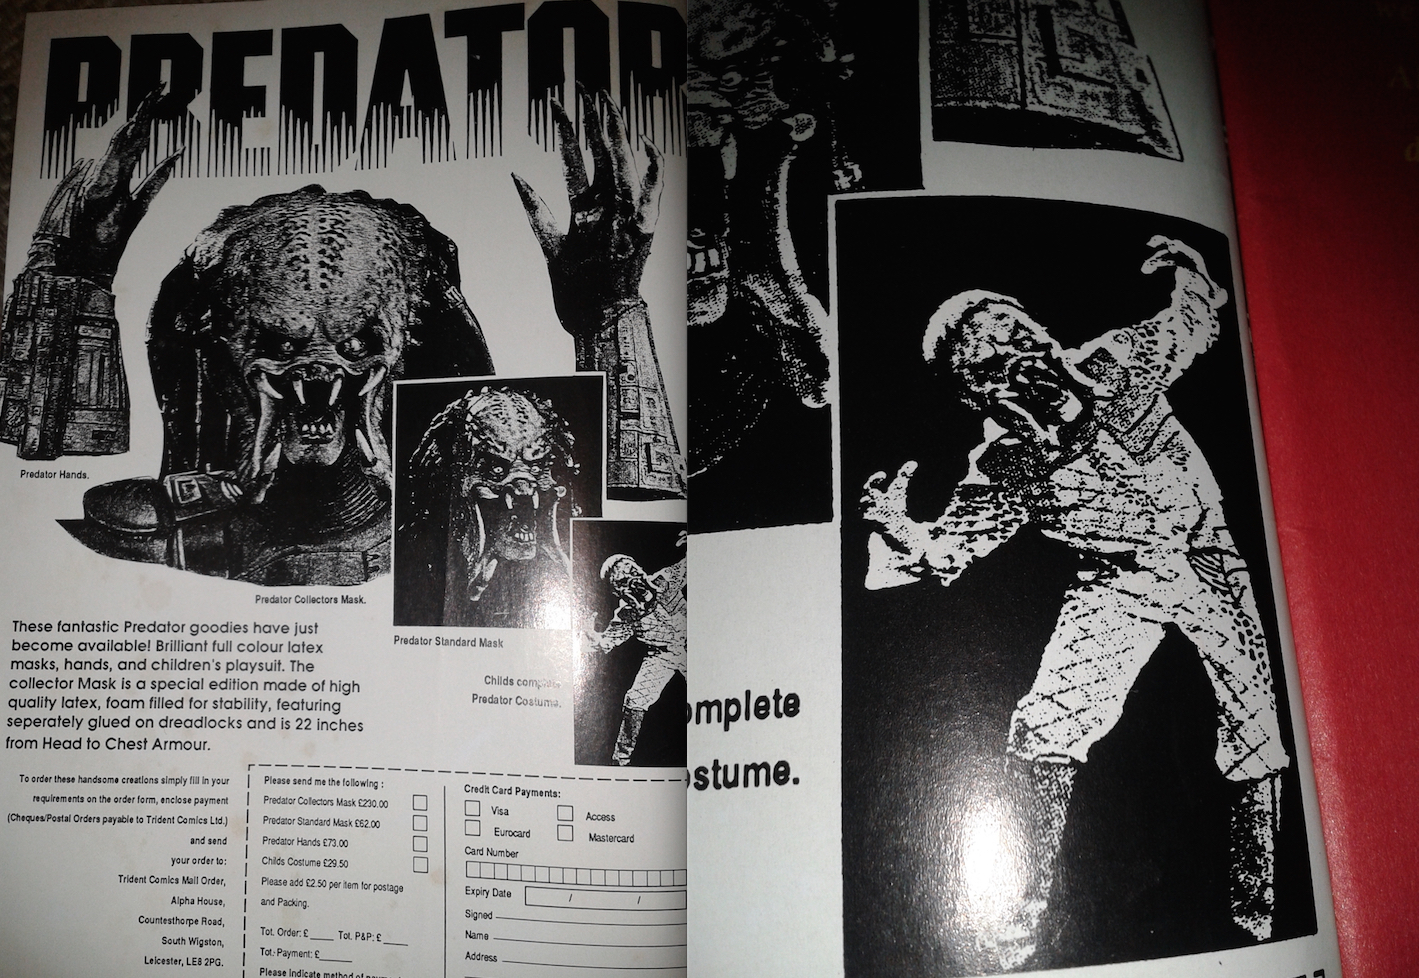 Predator Merchandise Advert - 1990s